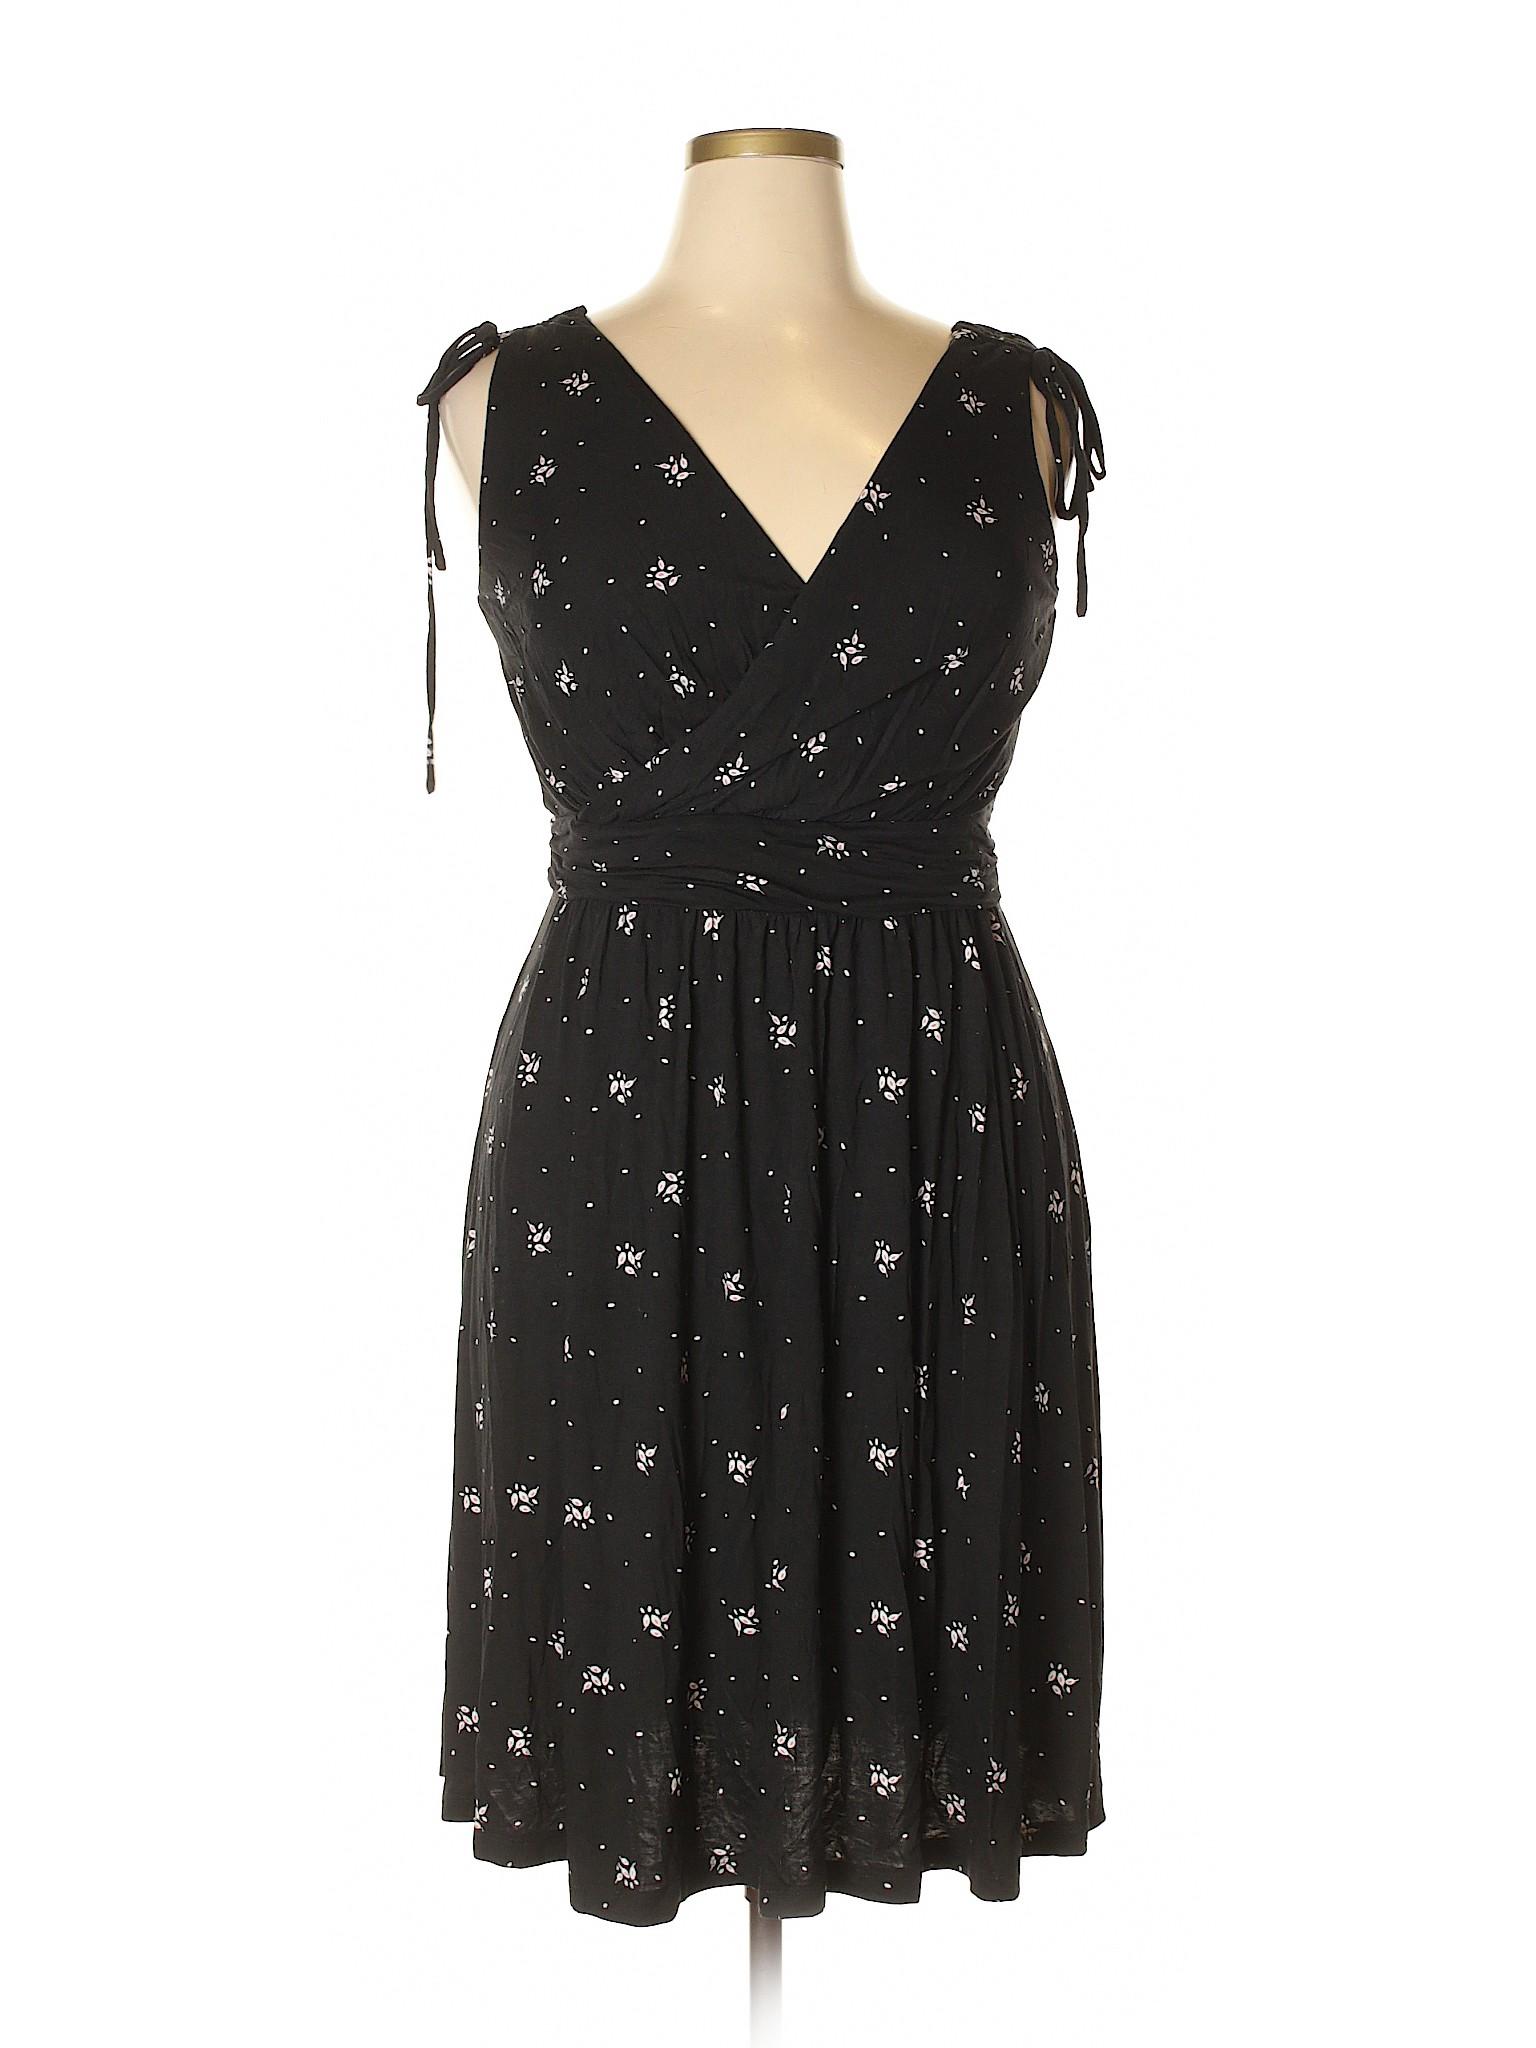 Dress Taylor LOFT winter Ann Boutique Casual n08ORq0z